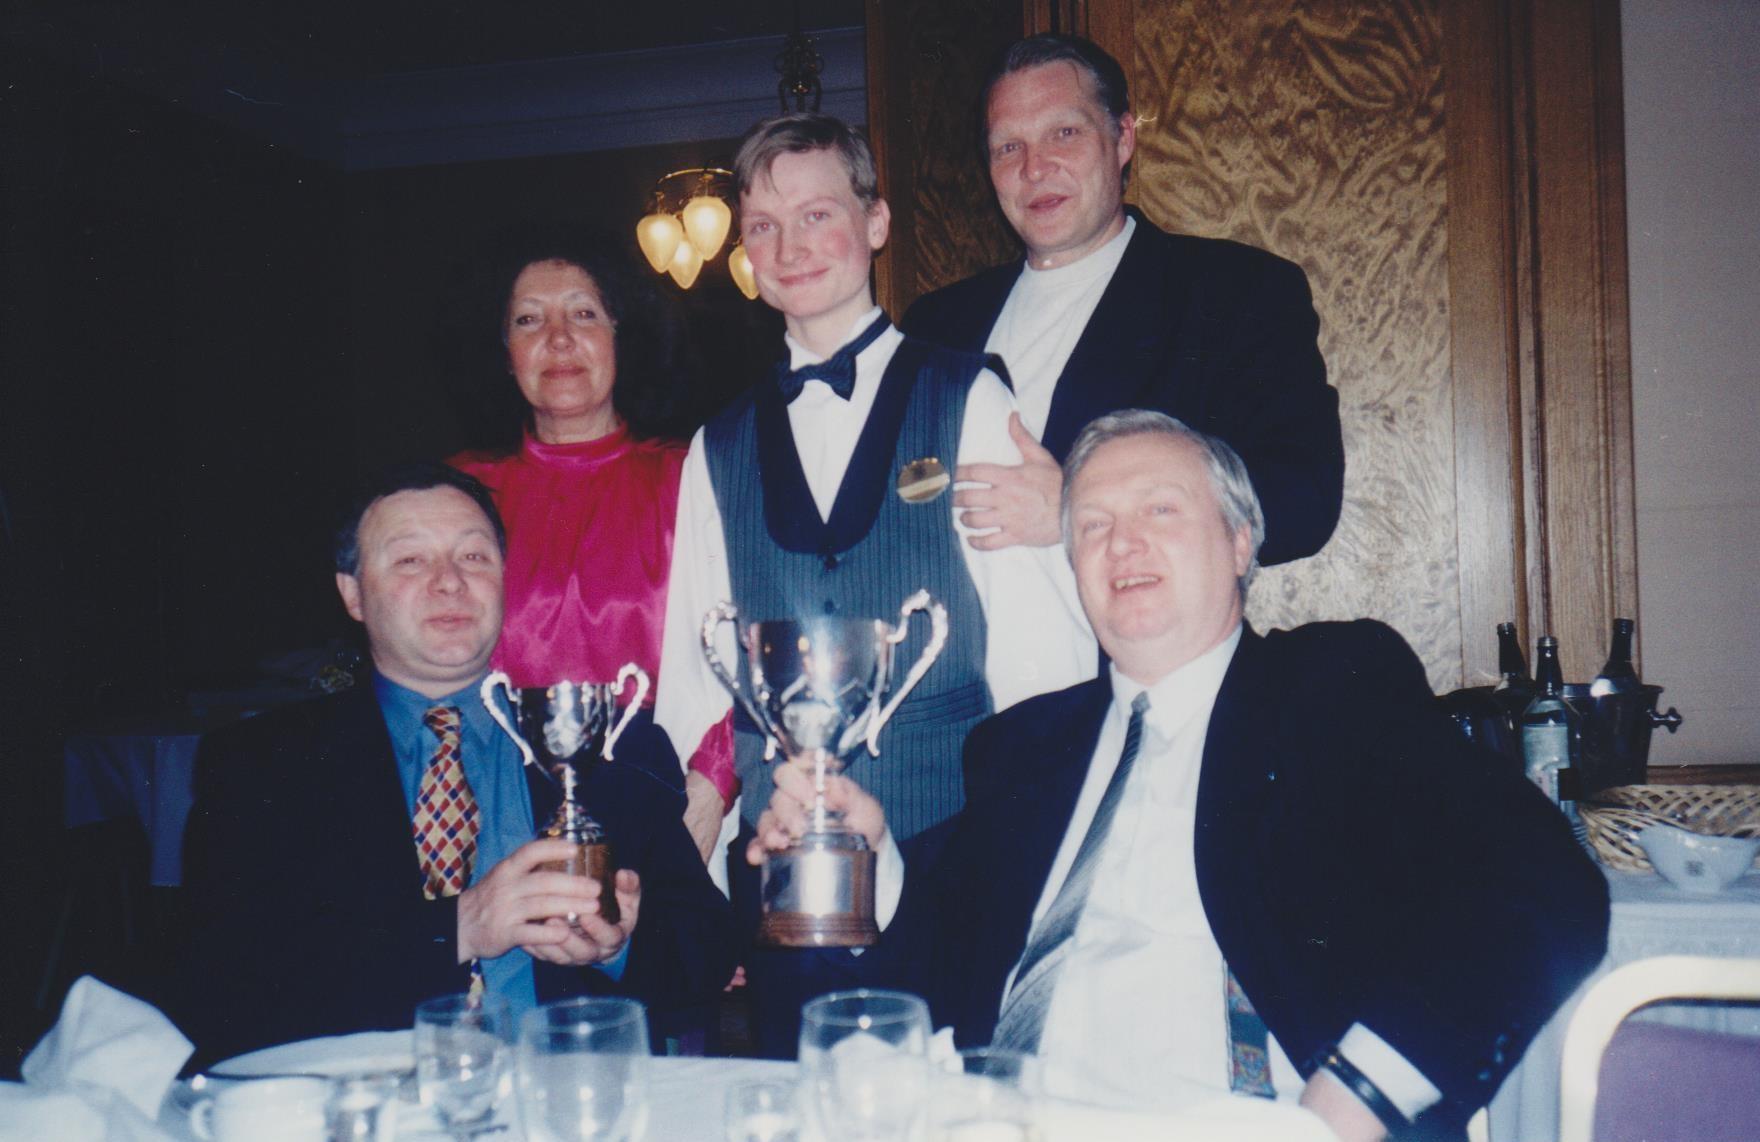 Минкевич Анатолий Адамович, Каливод Александр Васильевич и Воропаев Евгений Михайлович на фуршете в ресторане Националь 2000